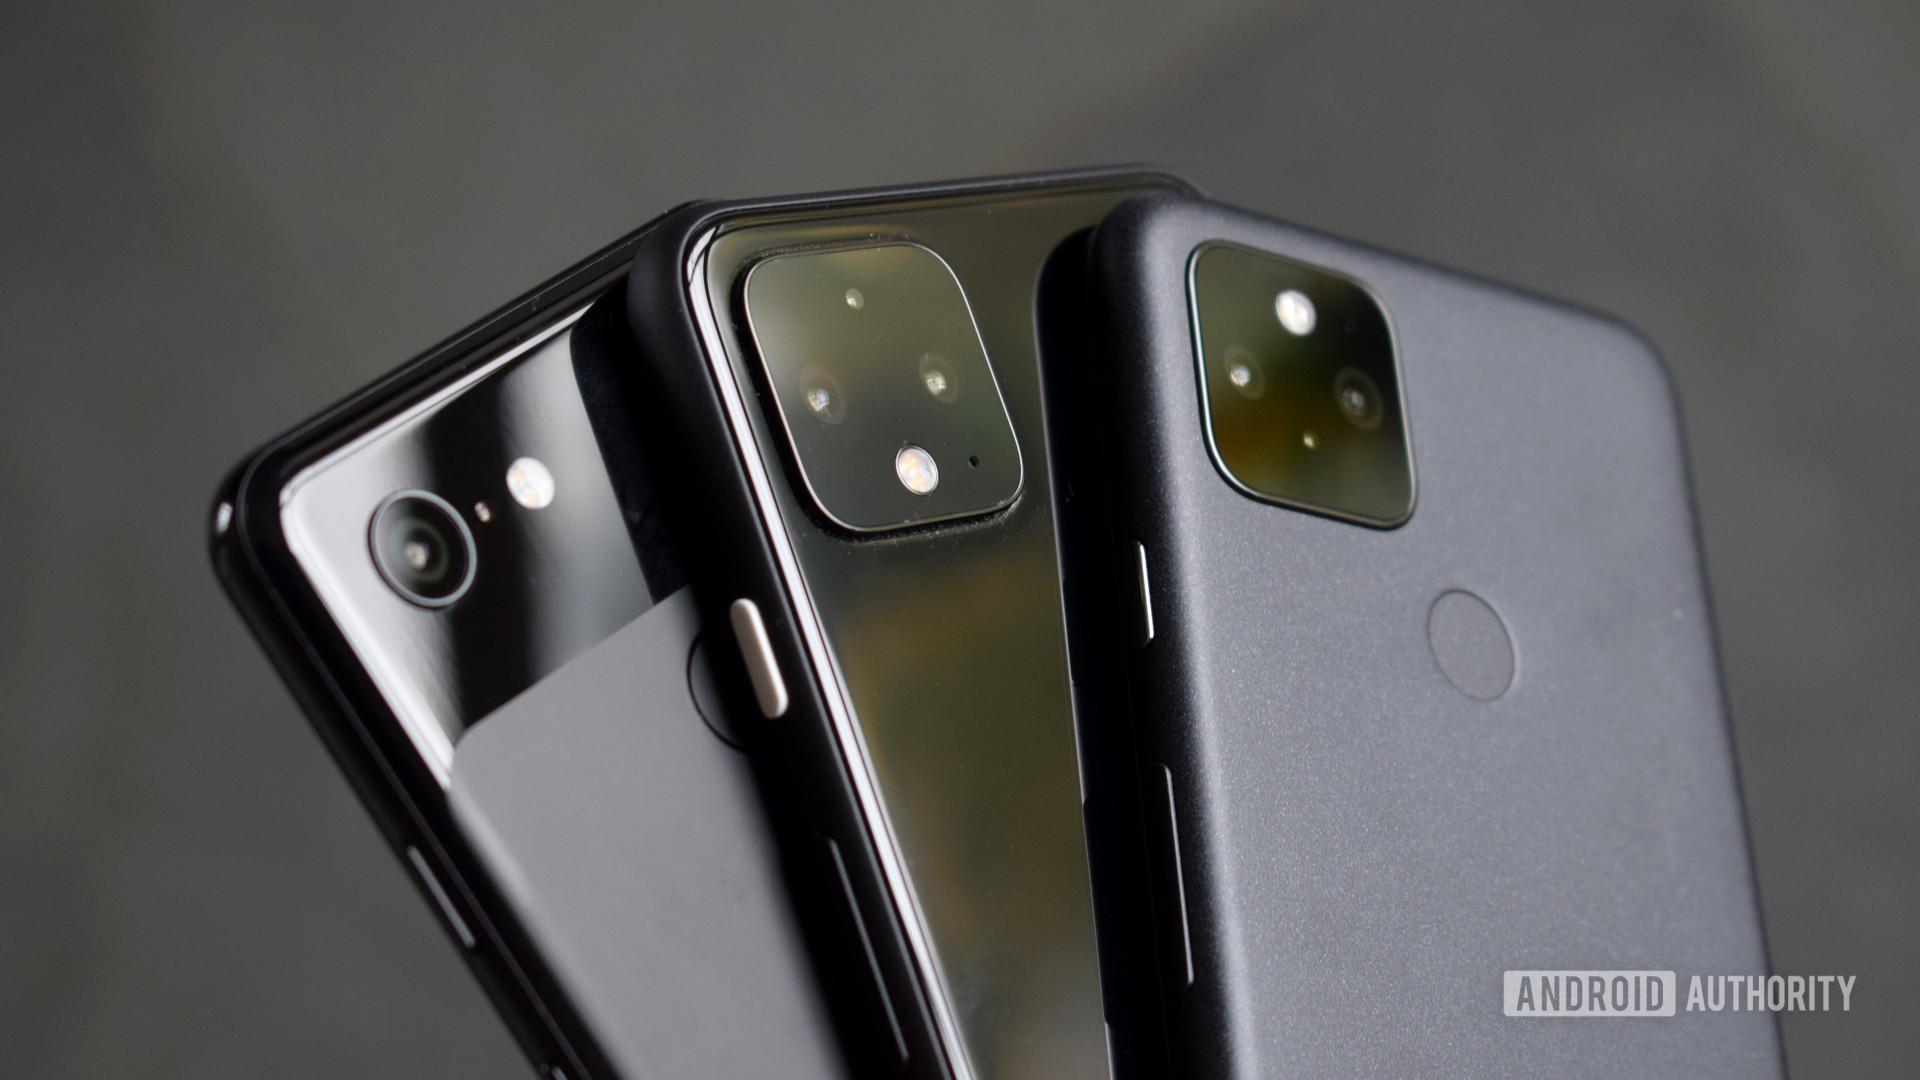 Google Pixel 5 Pixel 4 Pixel 3 cameras